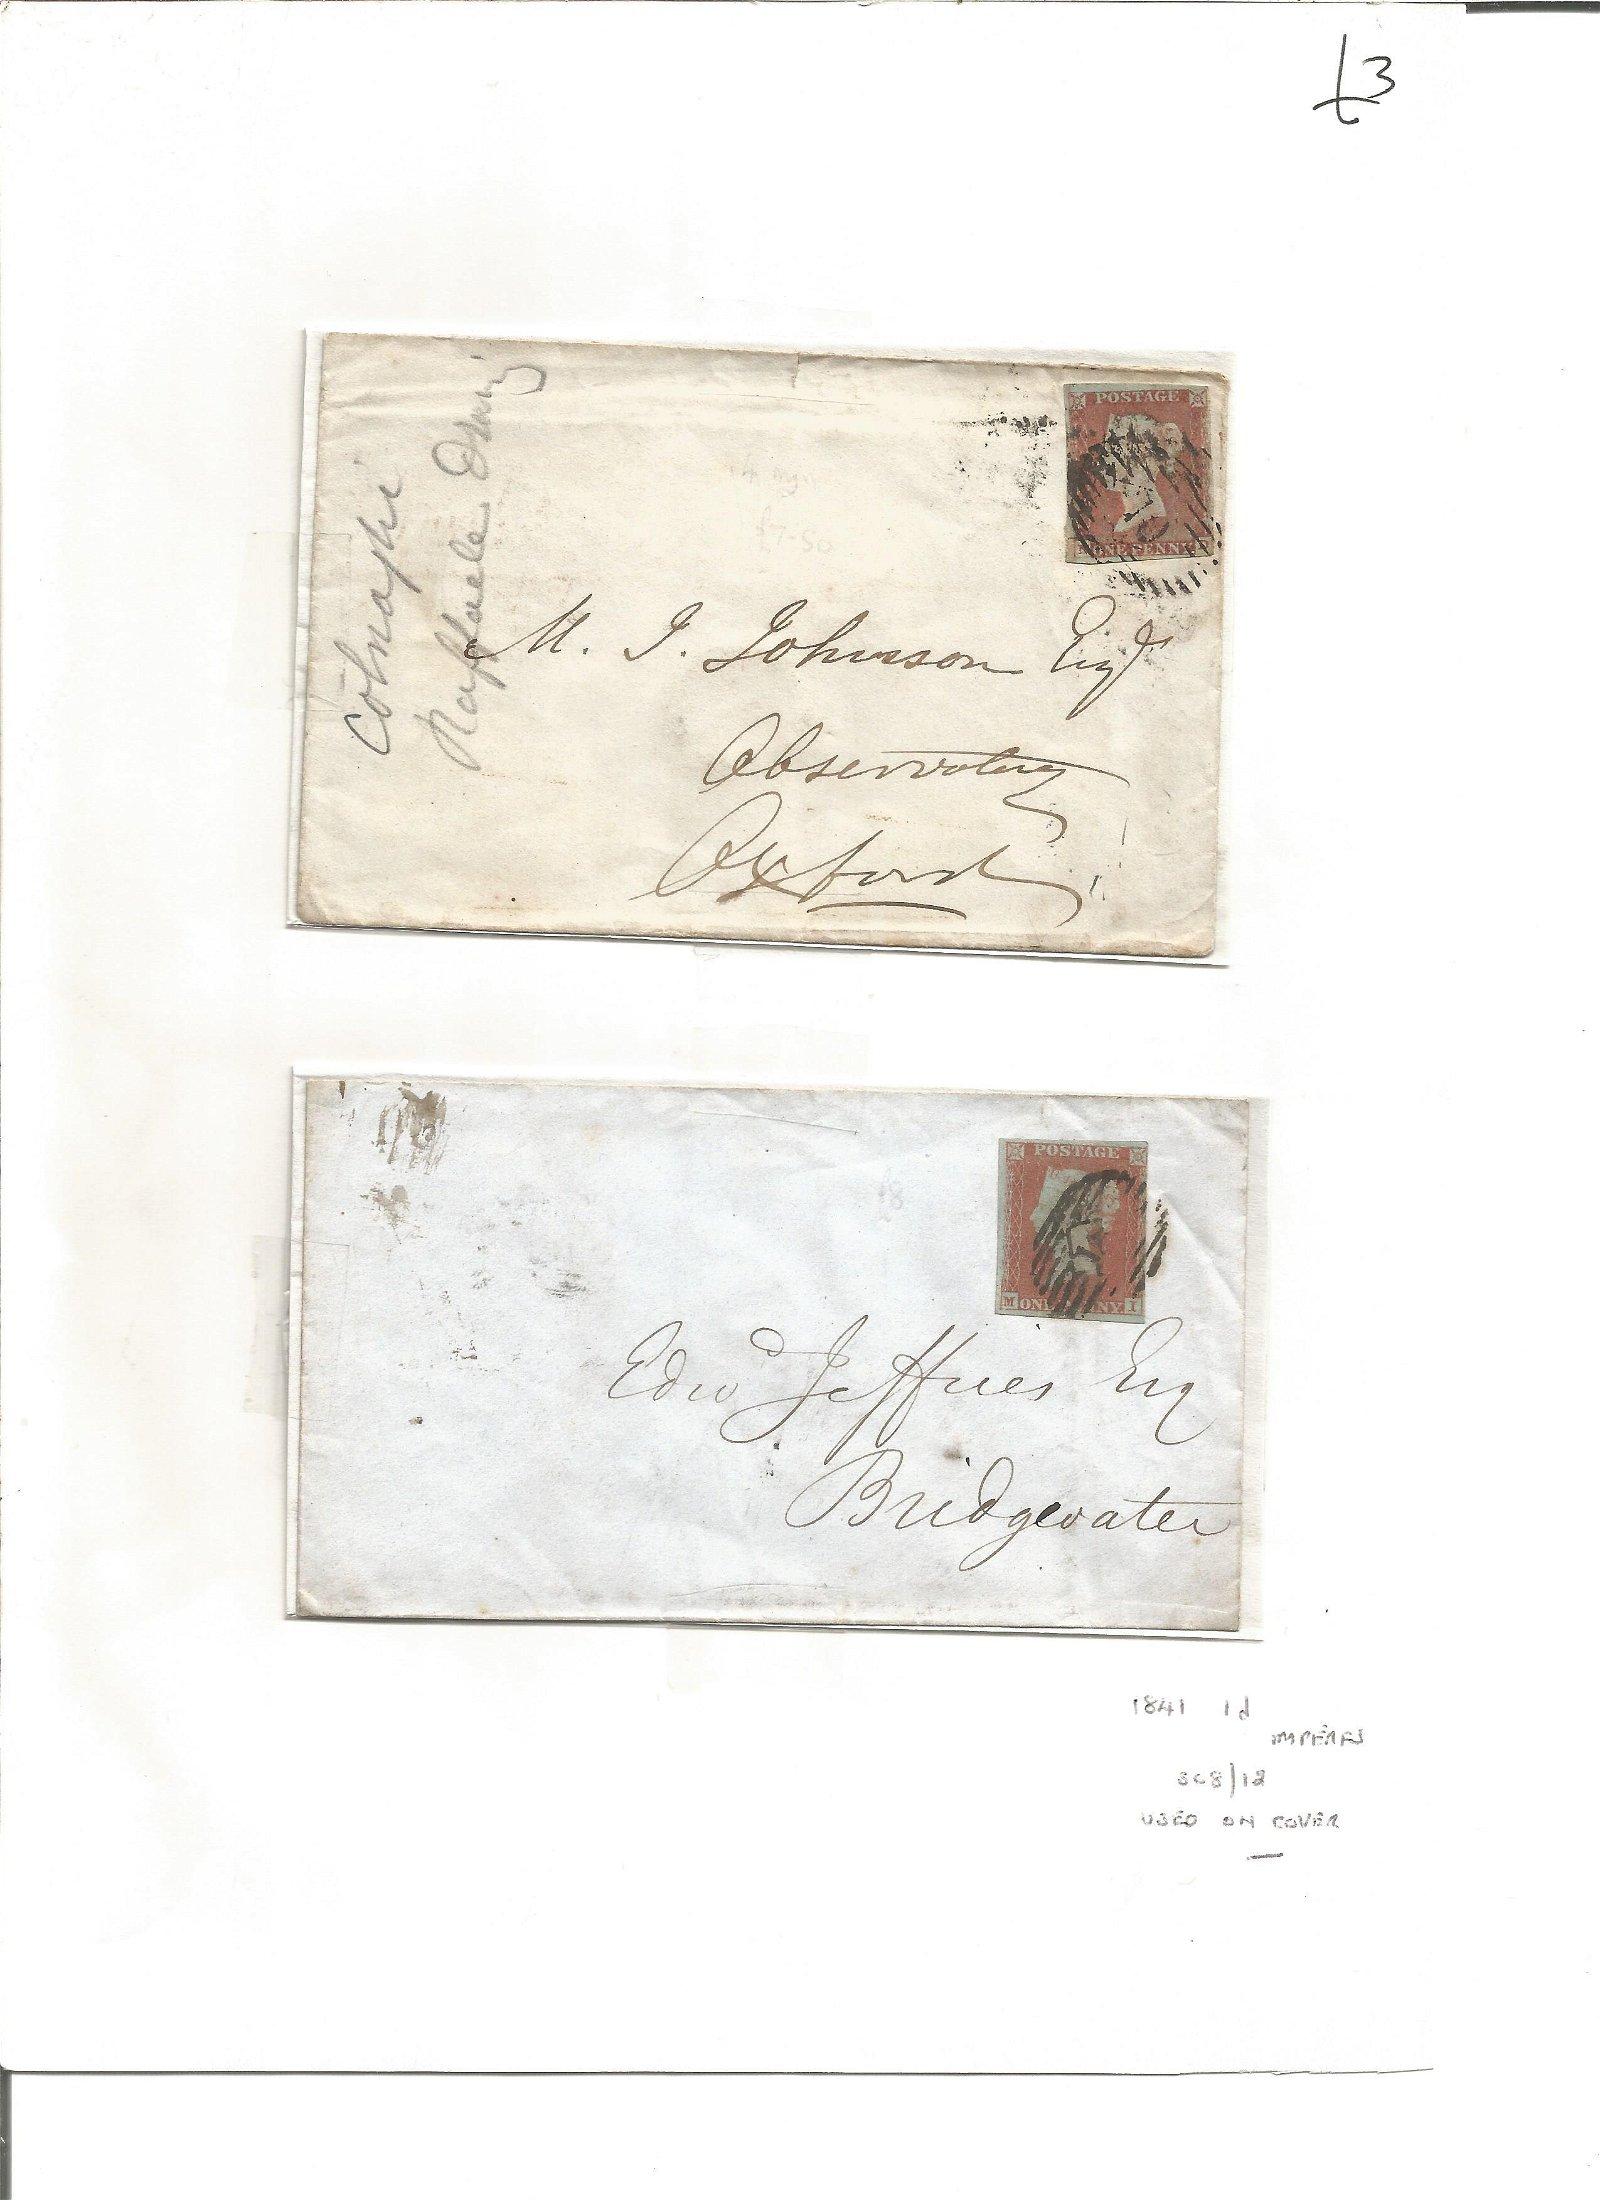 Postal History. 2 free fonts. 1841 1d imperfs SG8/12